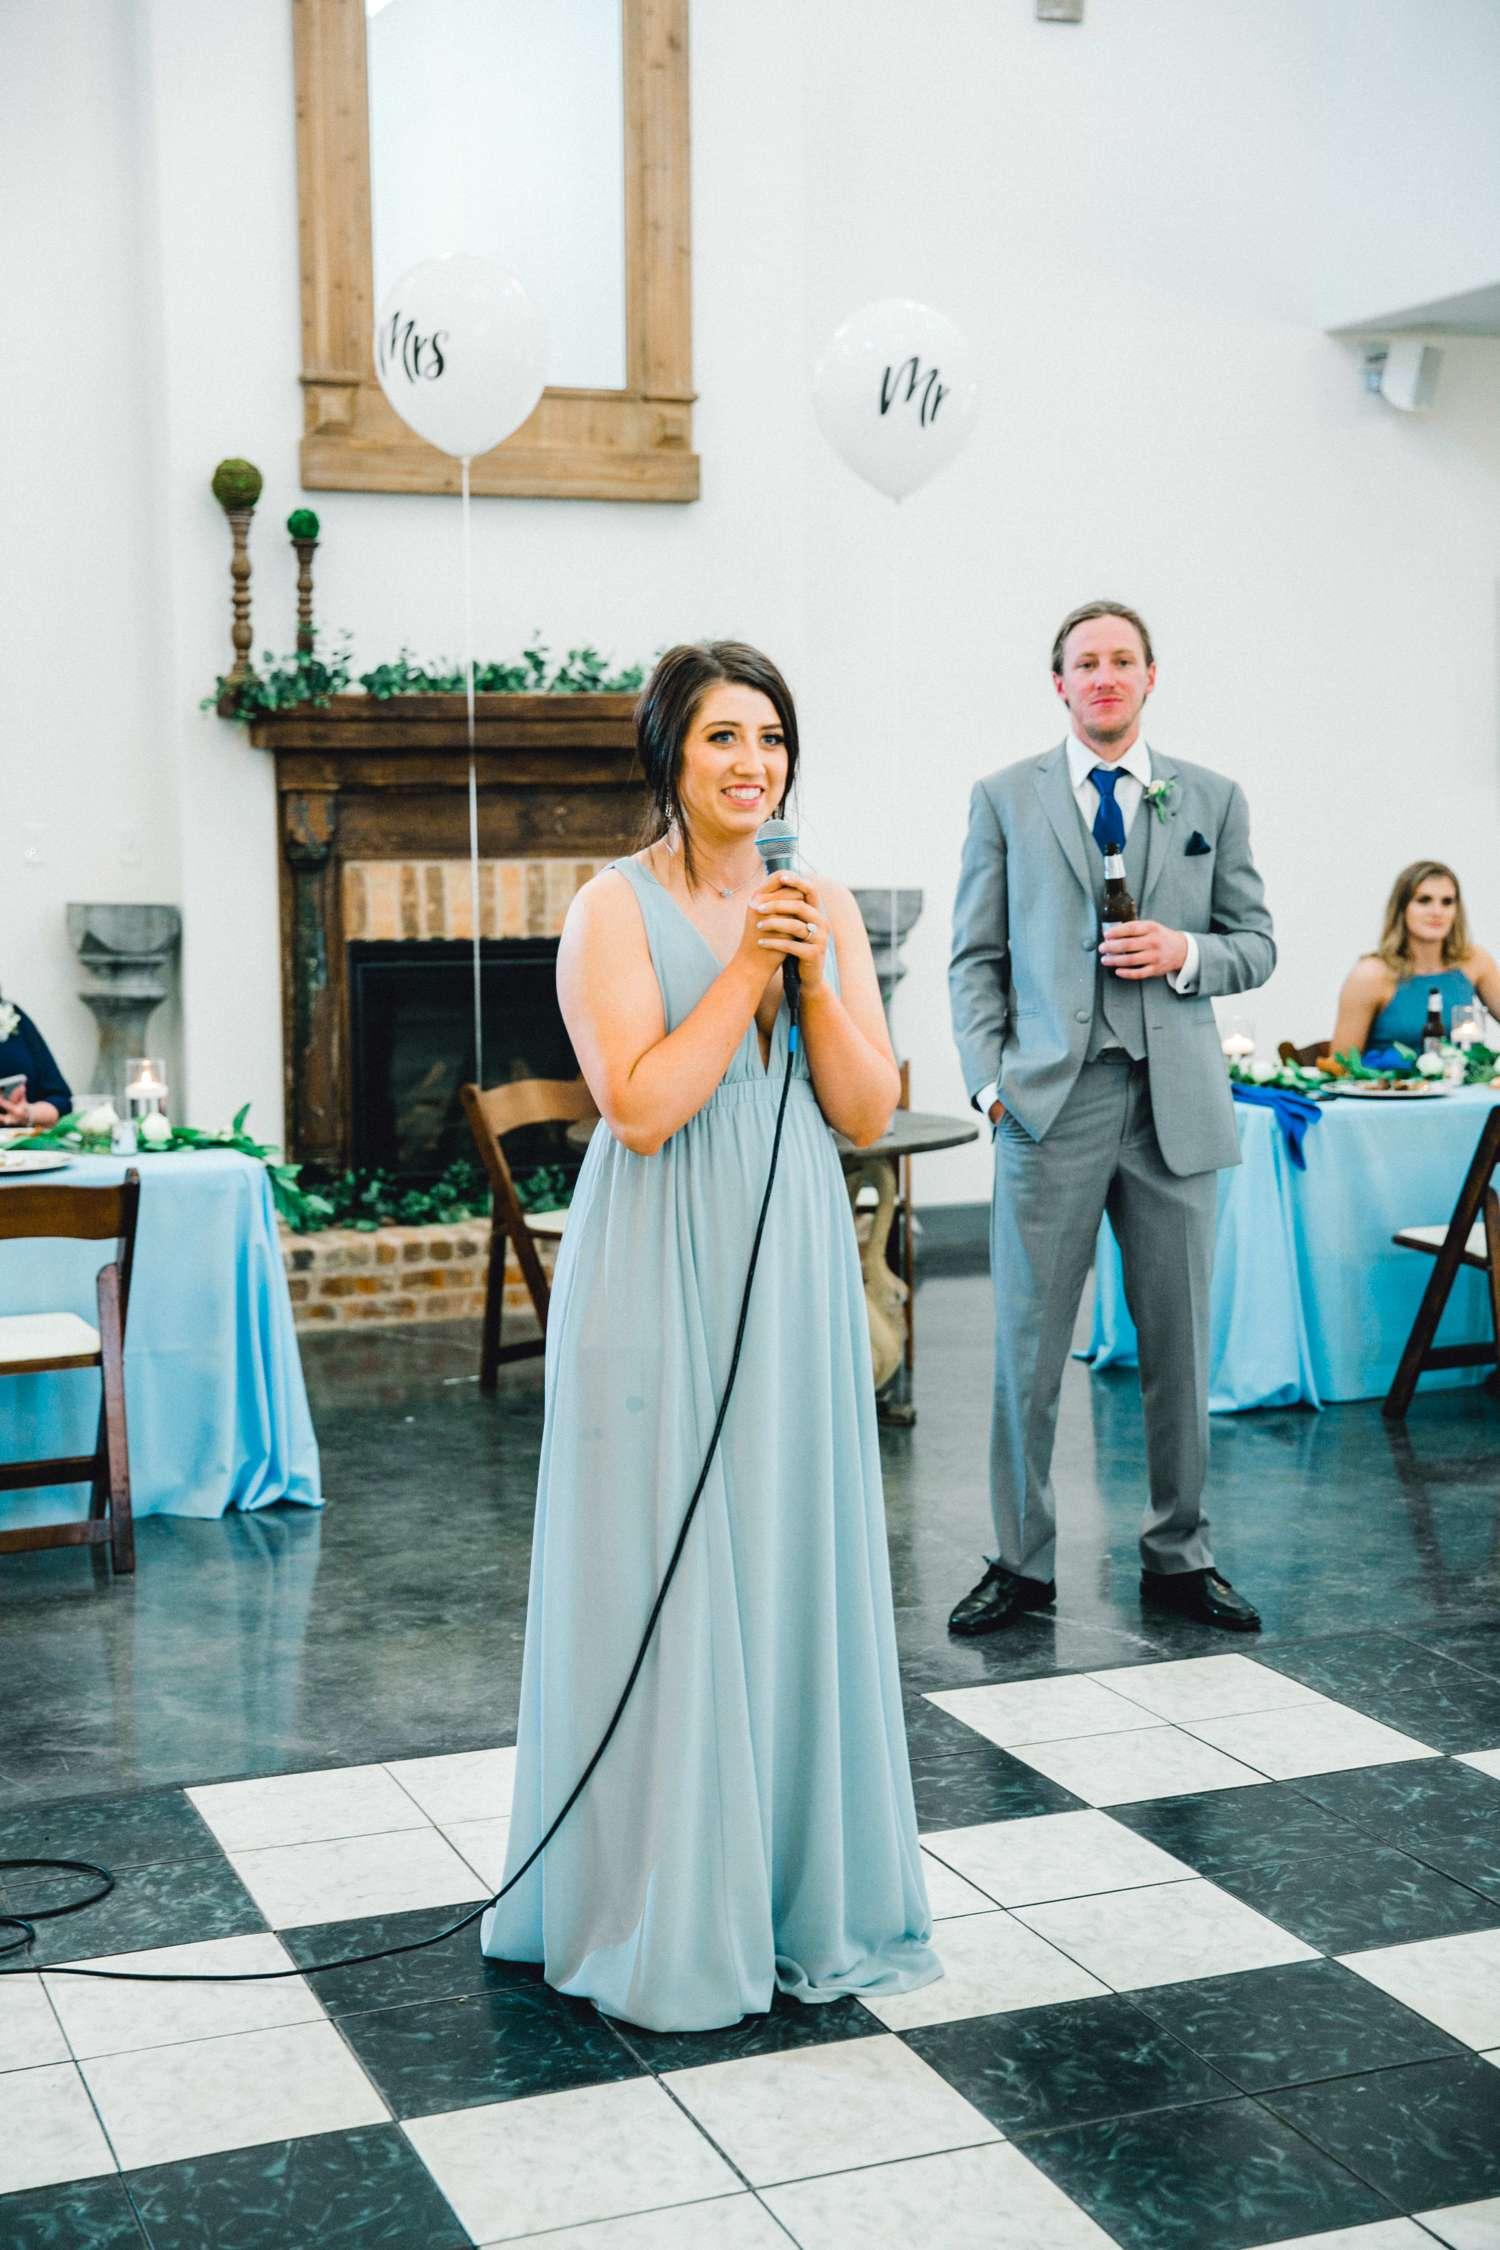 CASSIDY+AND+HARLEY+BRADLEY+EBERLEY+BROOKS+CHAPEL+LUBBOCK+WEDDING+PHOTOGRAPHER+ALLEEJ_0120.jpg